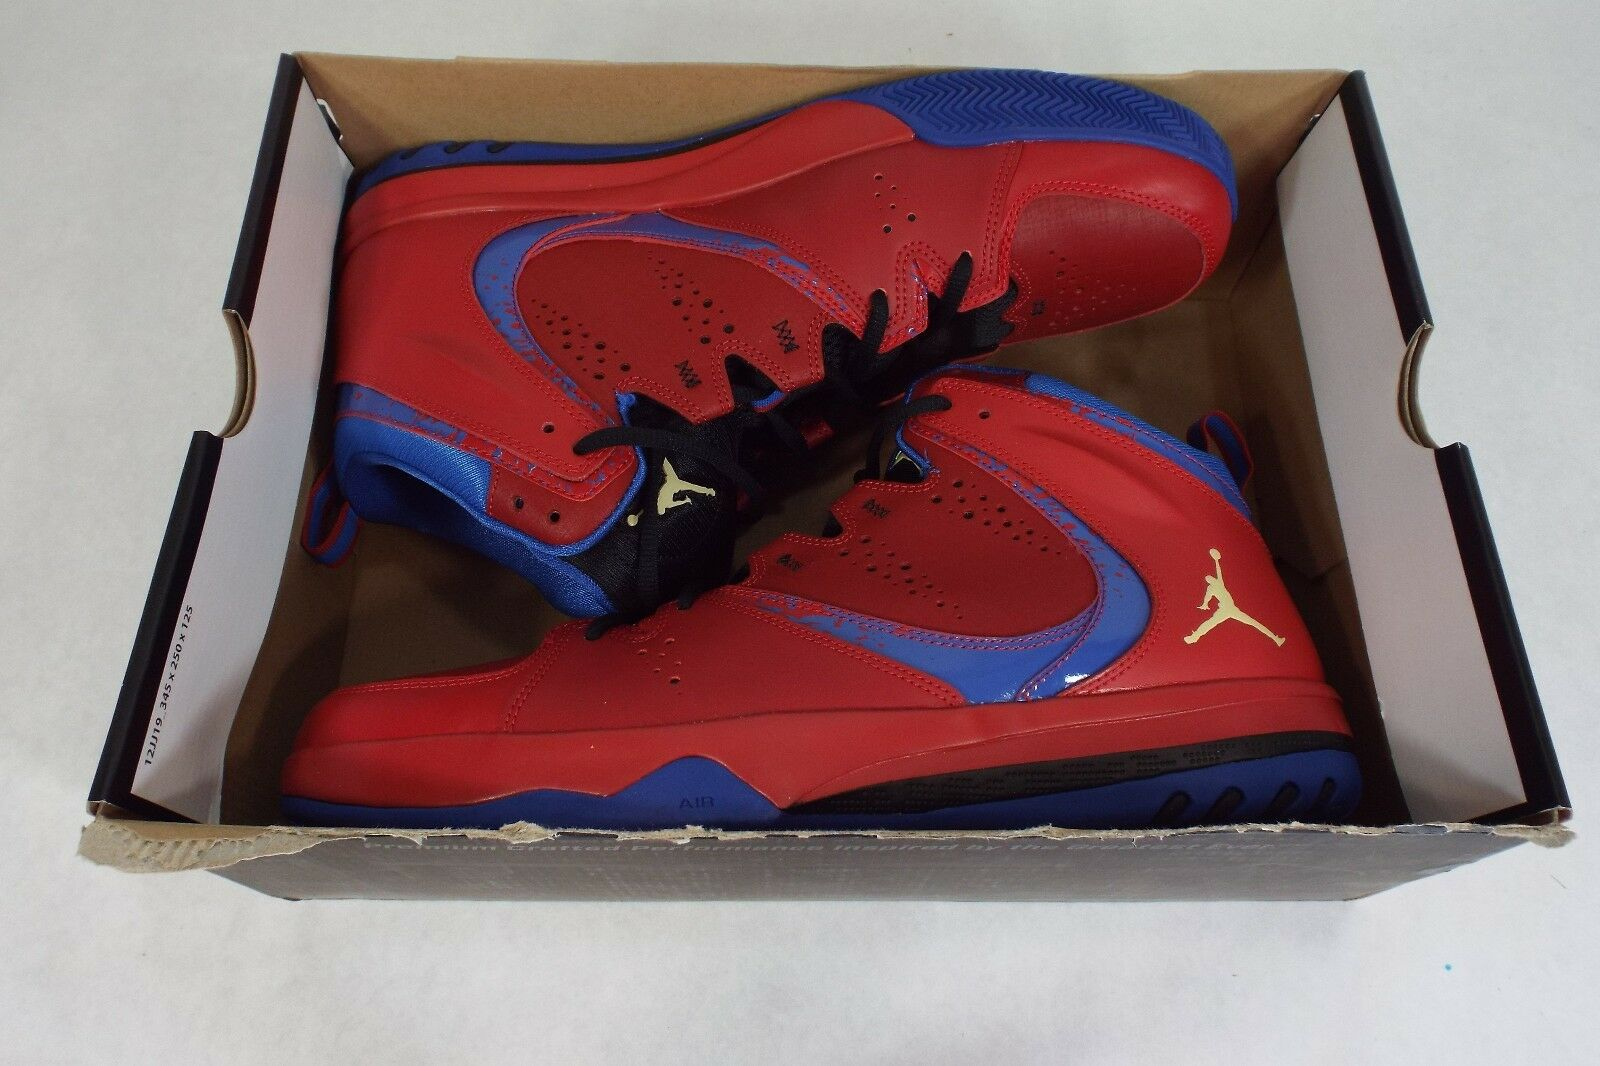 New Mens 13 NIKE Jordan Shoes Phase 23 2 Red Basketball Shoes Jordan  115 602671-607 b59bf7